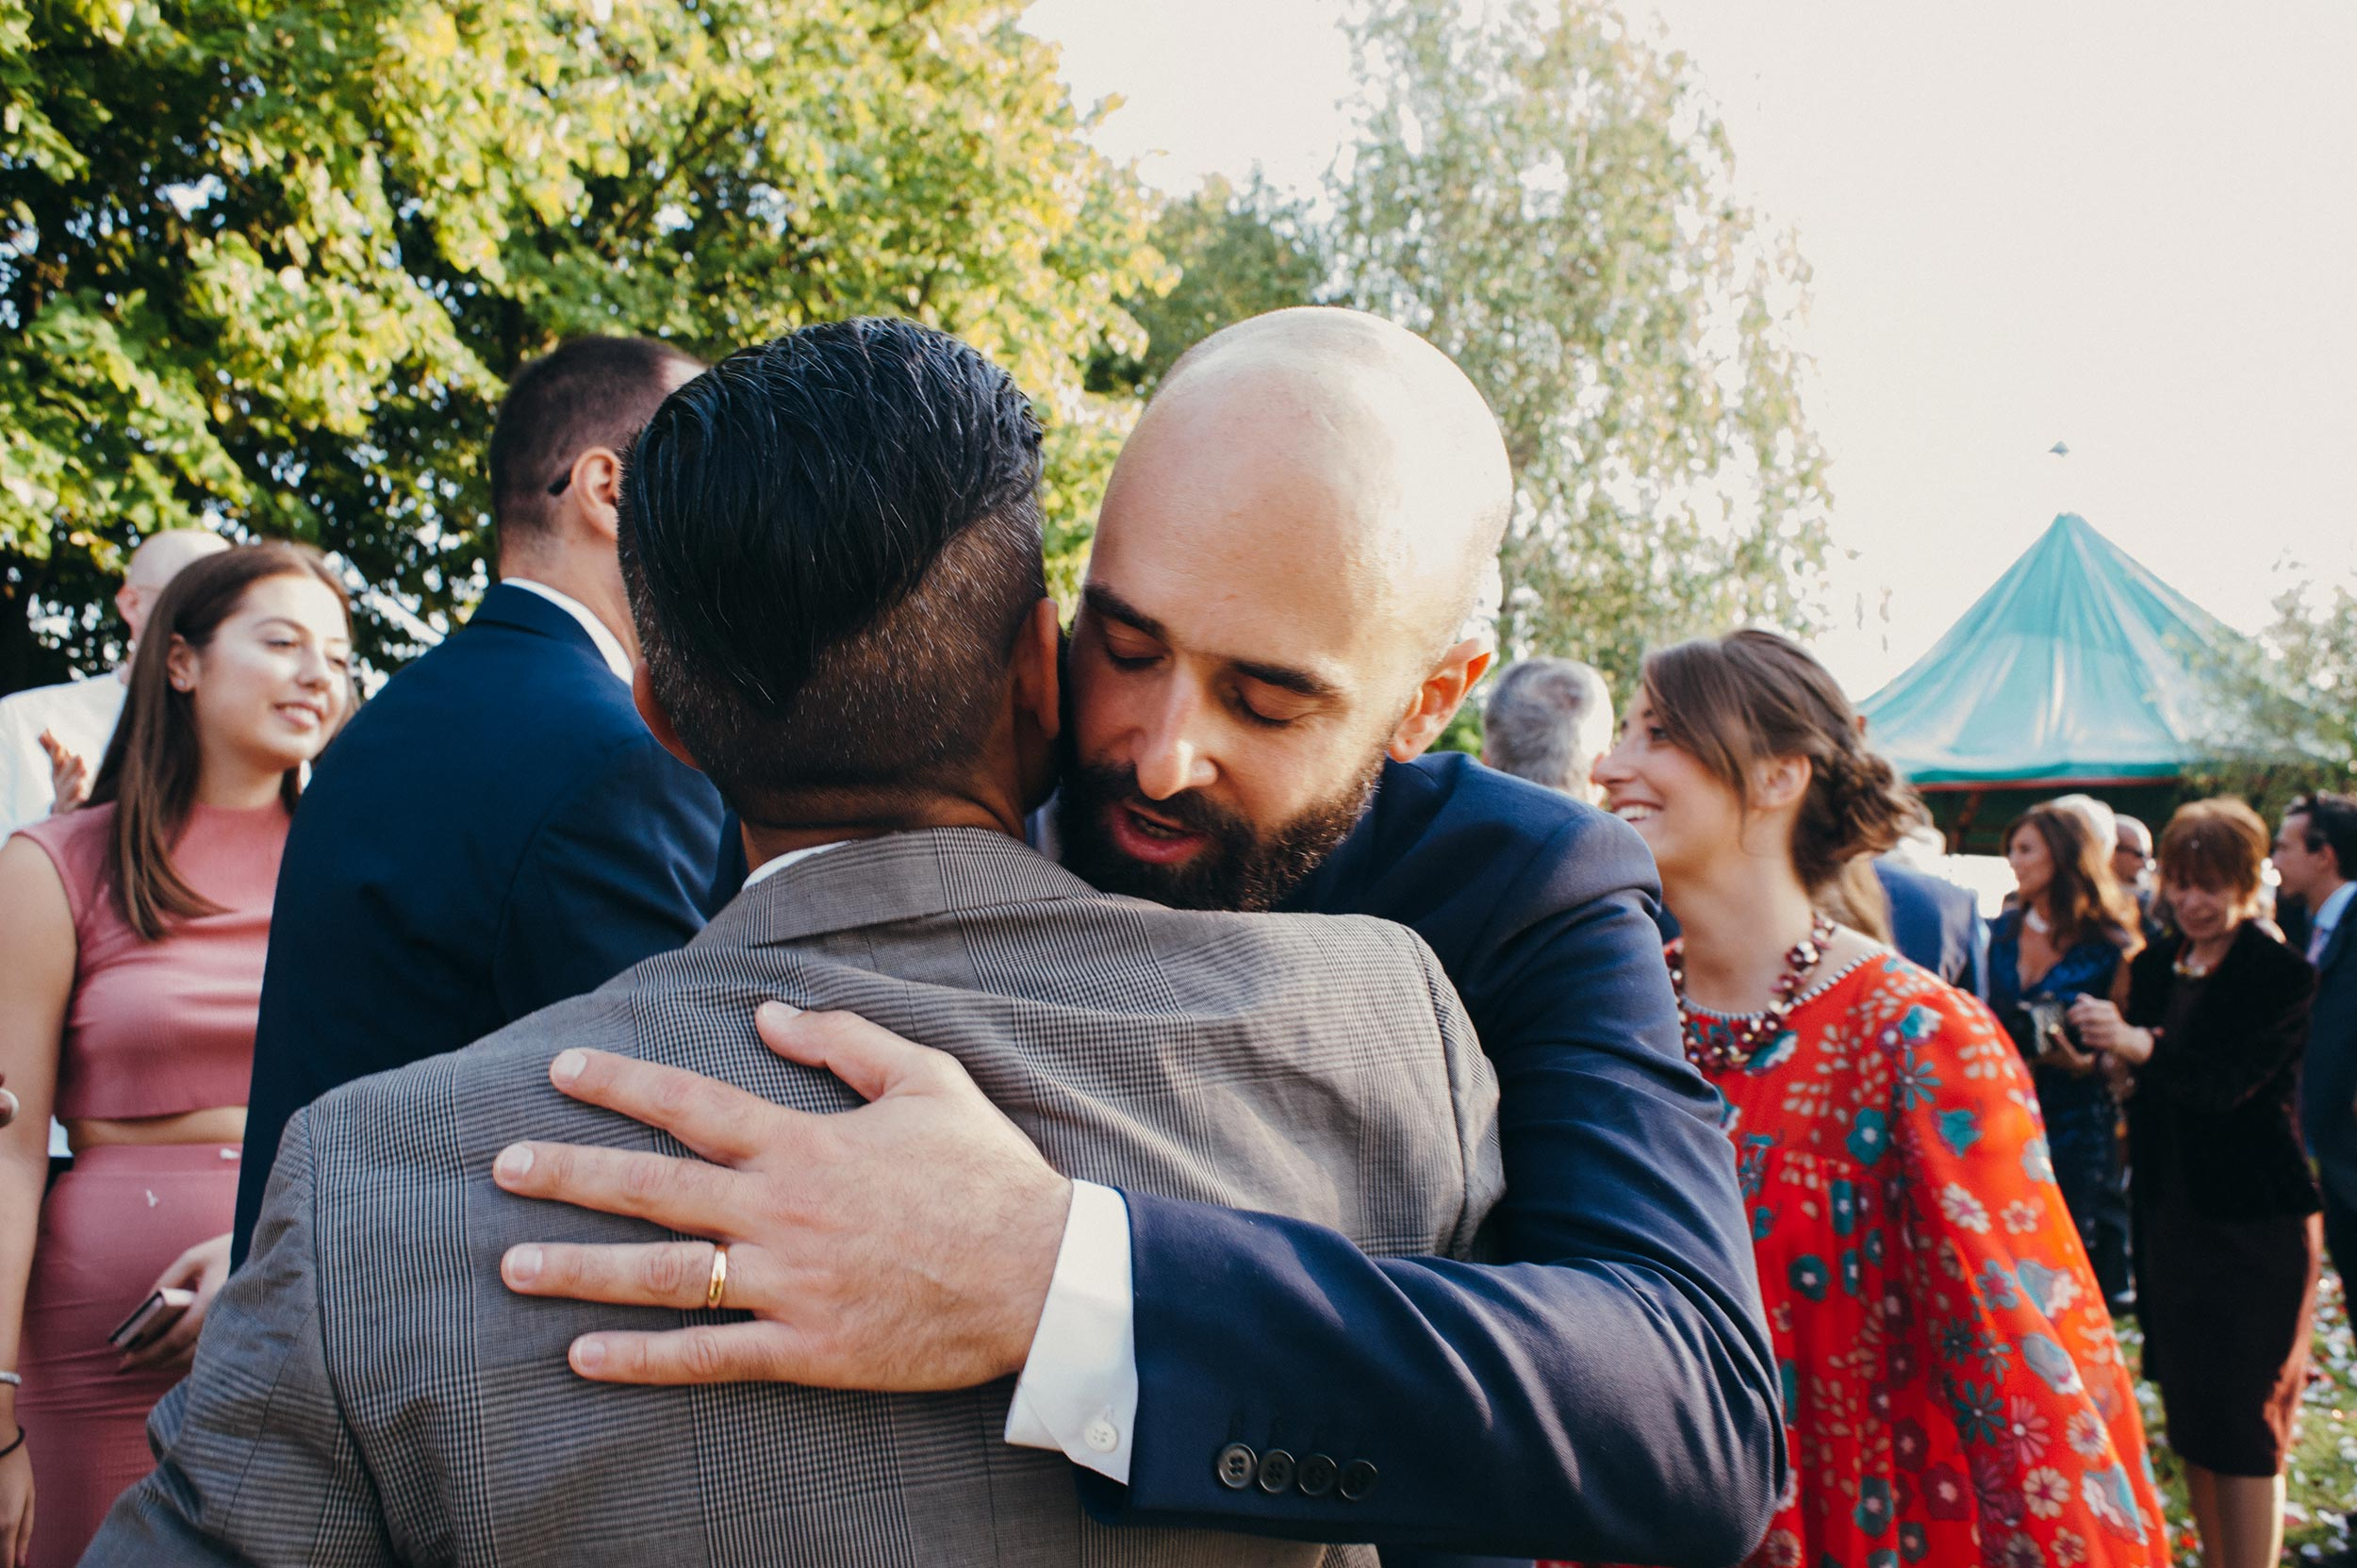 2016-Davor-Chiara-Monferrato-Asti-Vercelli-Wedding-Photographer-Italy-Alessandro-Avenali-36.jpg